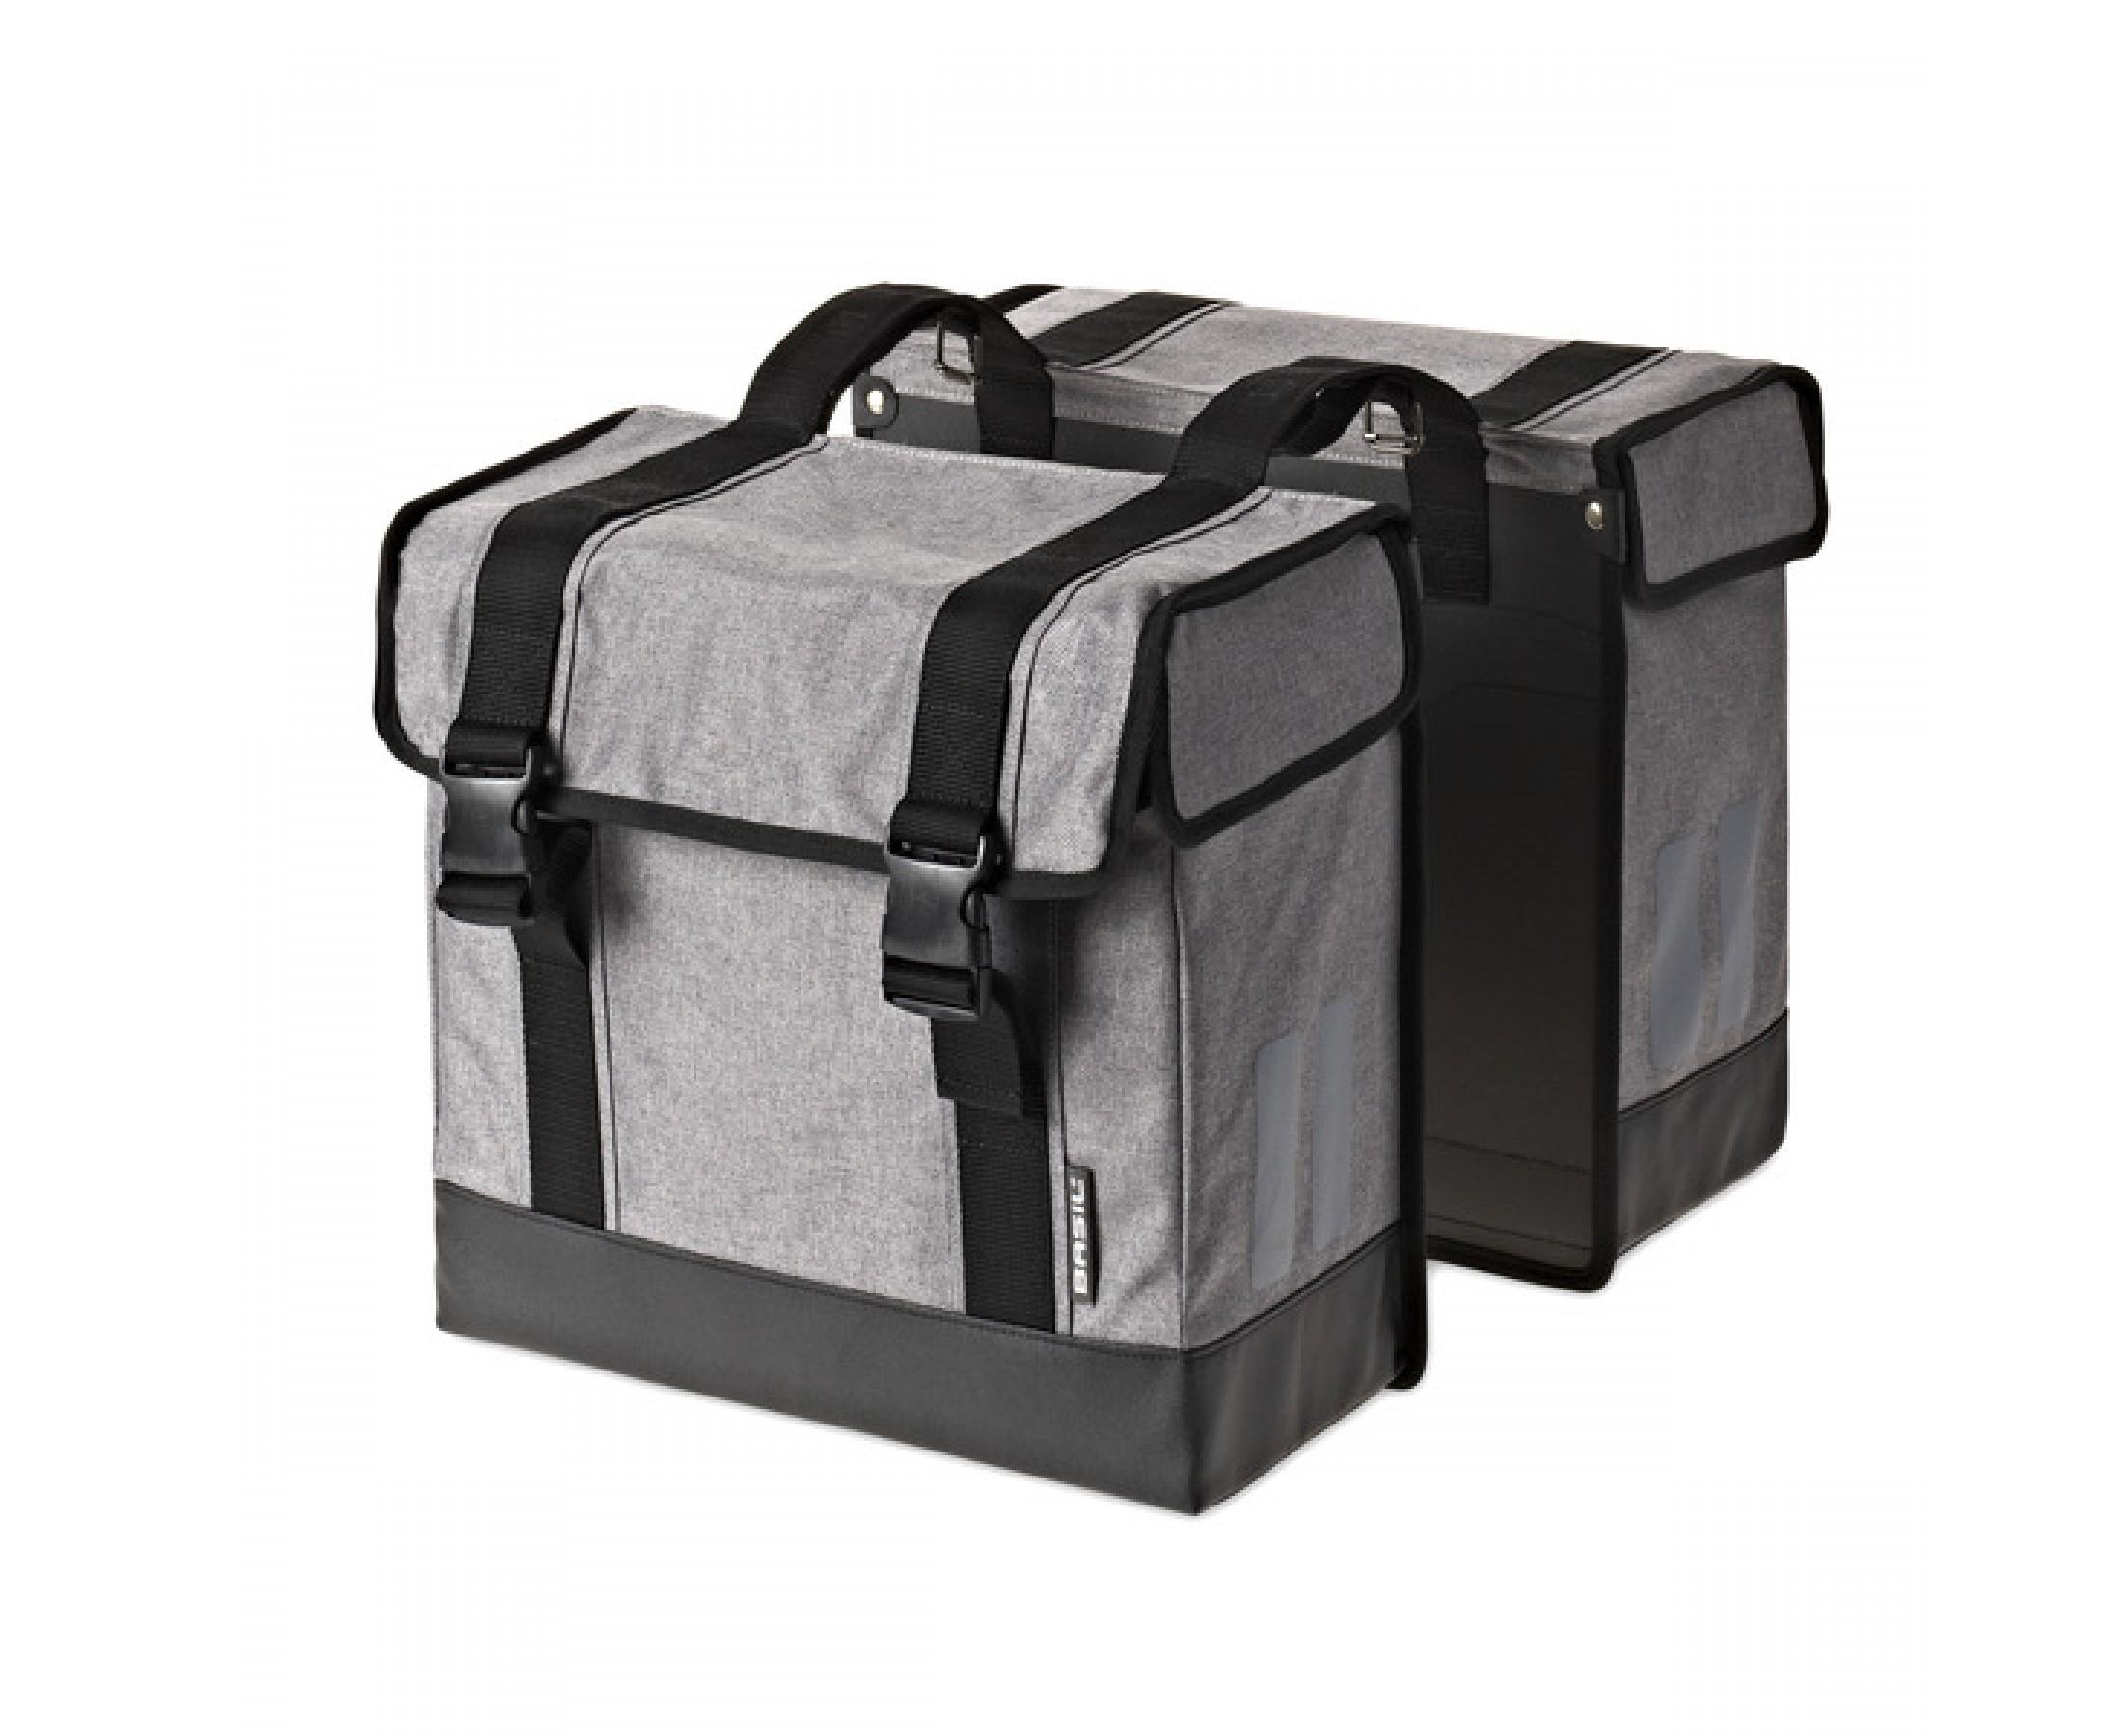 71b14d09c8 Cyklistická taška Basil Sports double bag